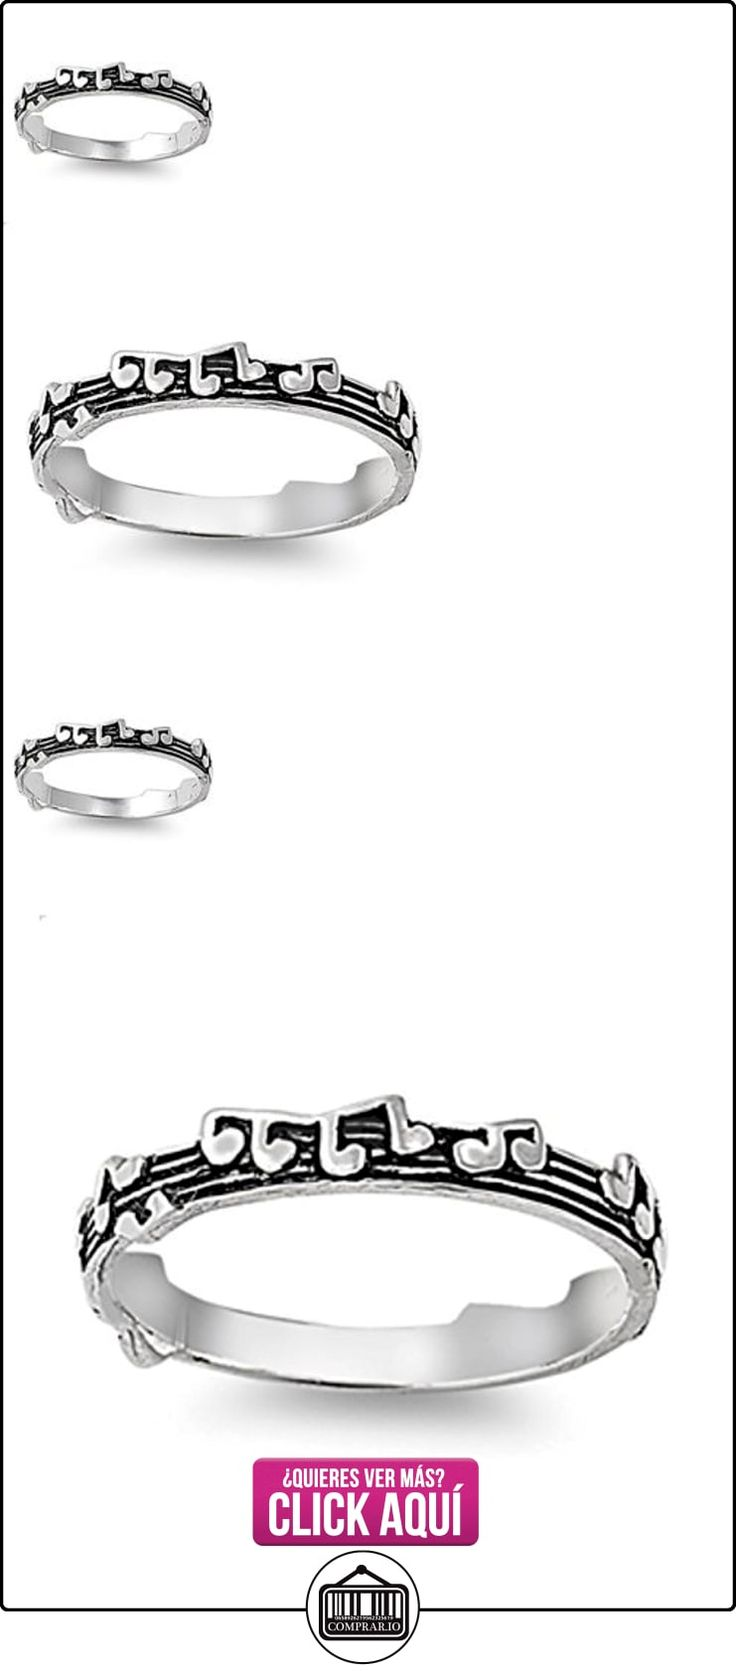 Notas plata esterlina anillo de Música - Tamaño, 19 (18,79 mm)  ✿ Joyas para mujer - Las mejores ofertas ✿ ▬► Ver oferta: https://comprar.io/goto/B00DMMILX6